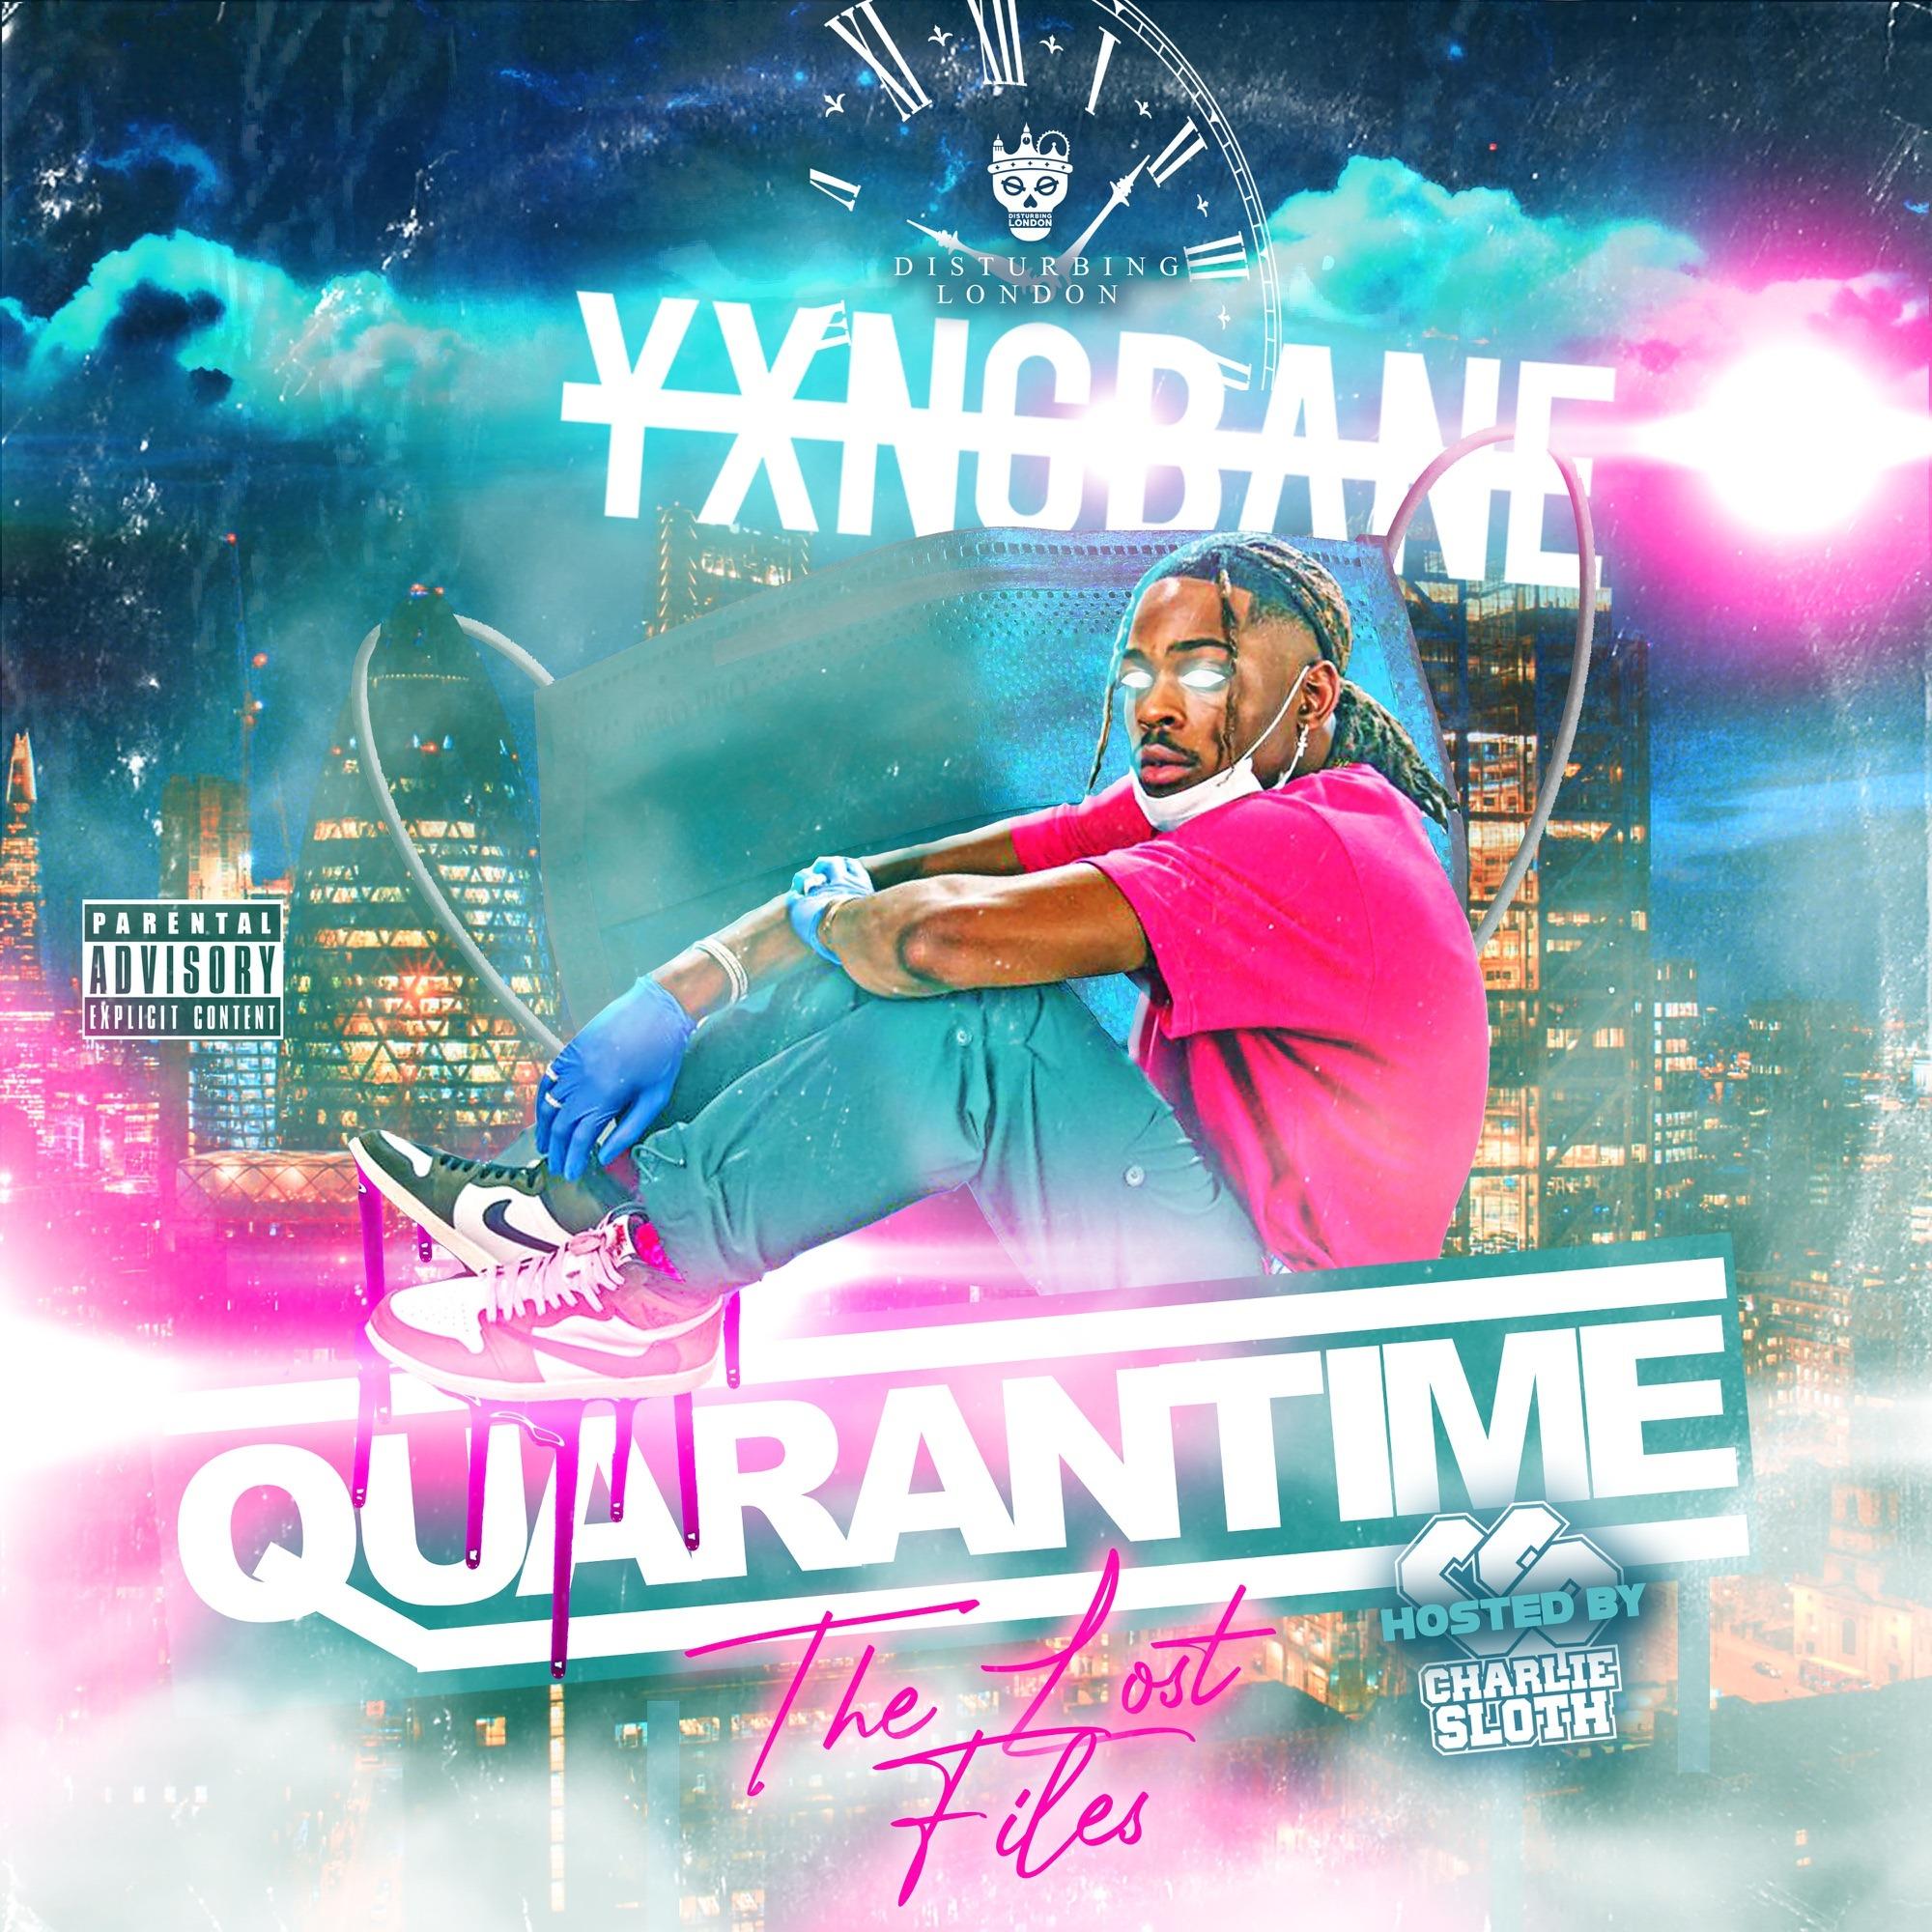 Yxng Bane – Quarantime: The Lost Files